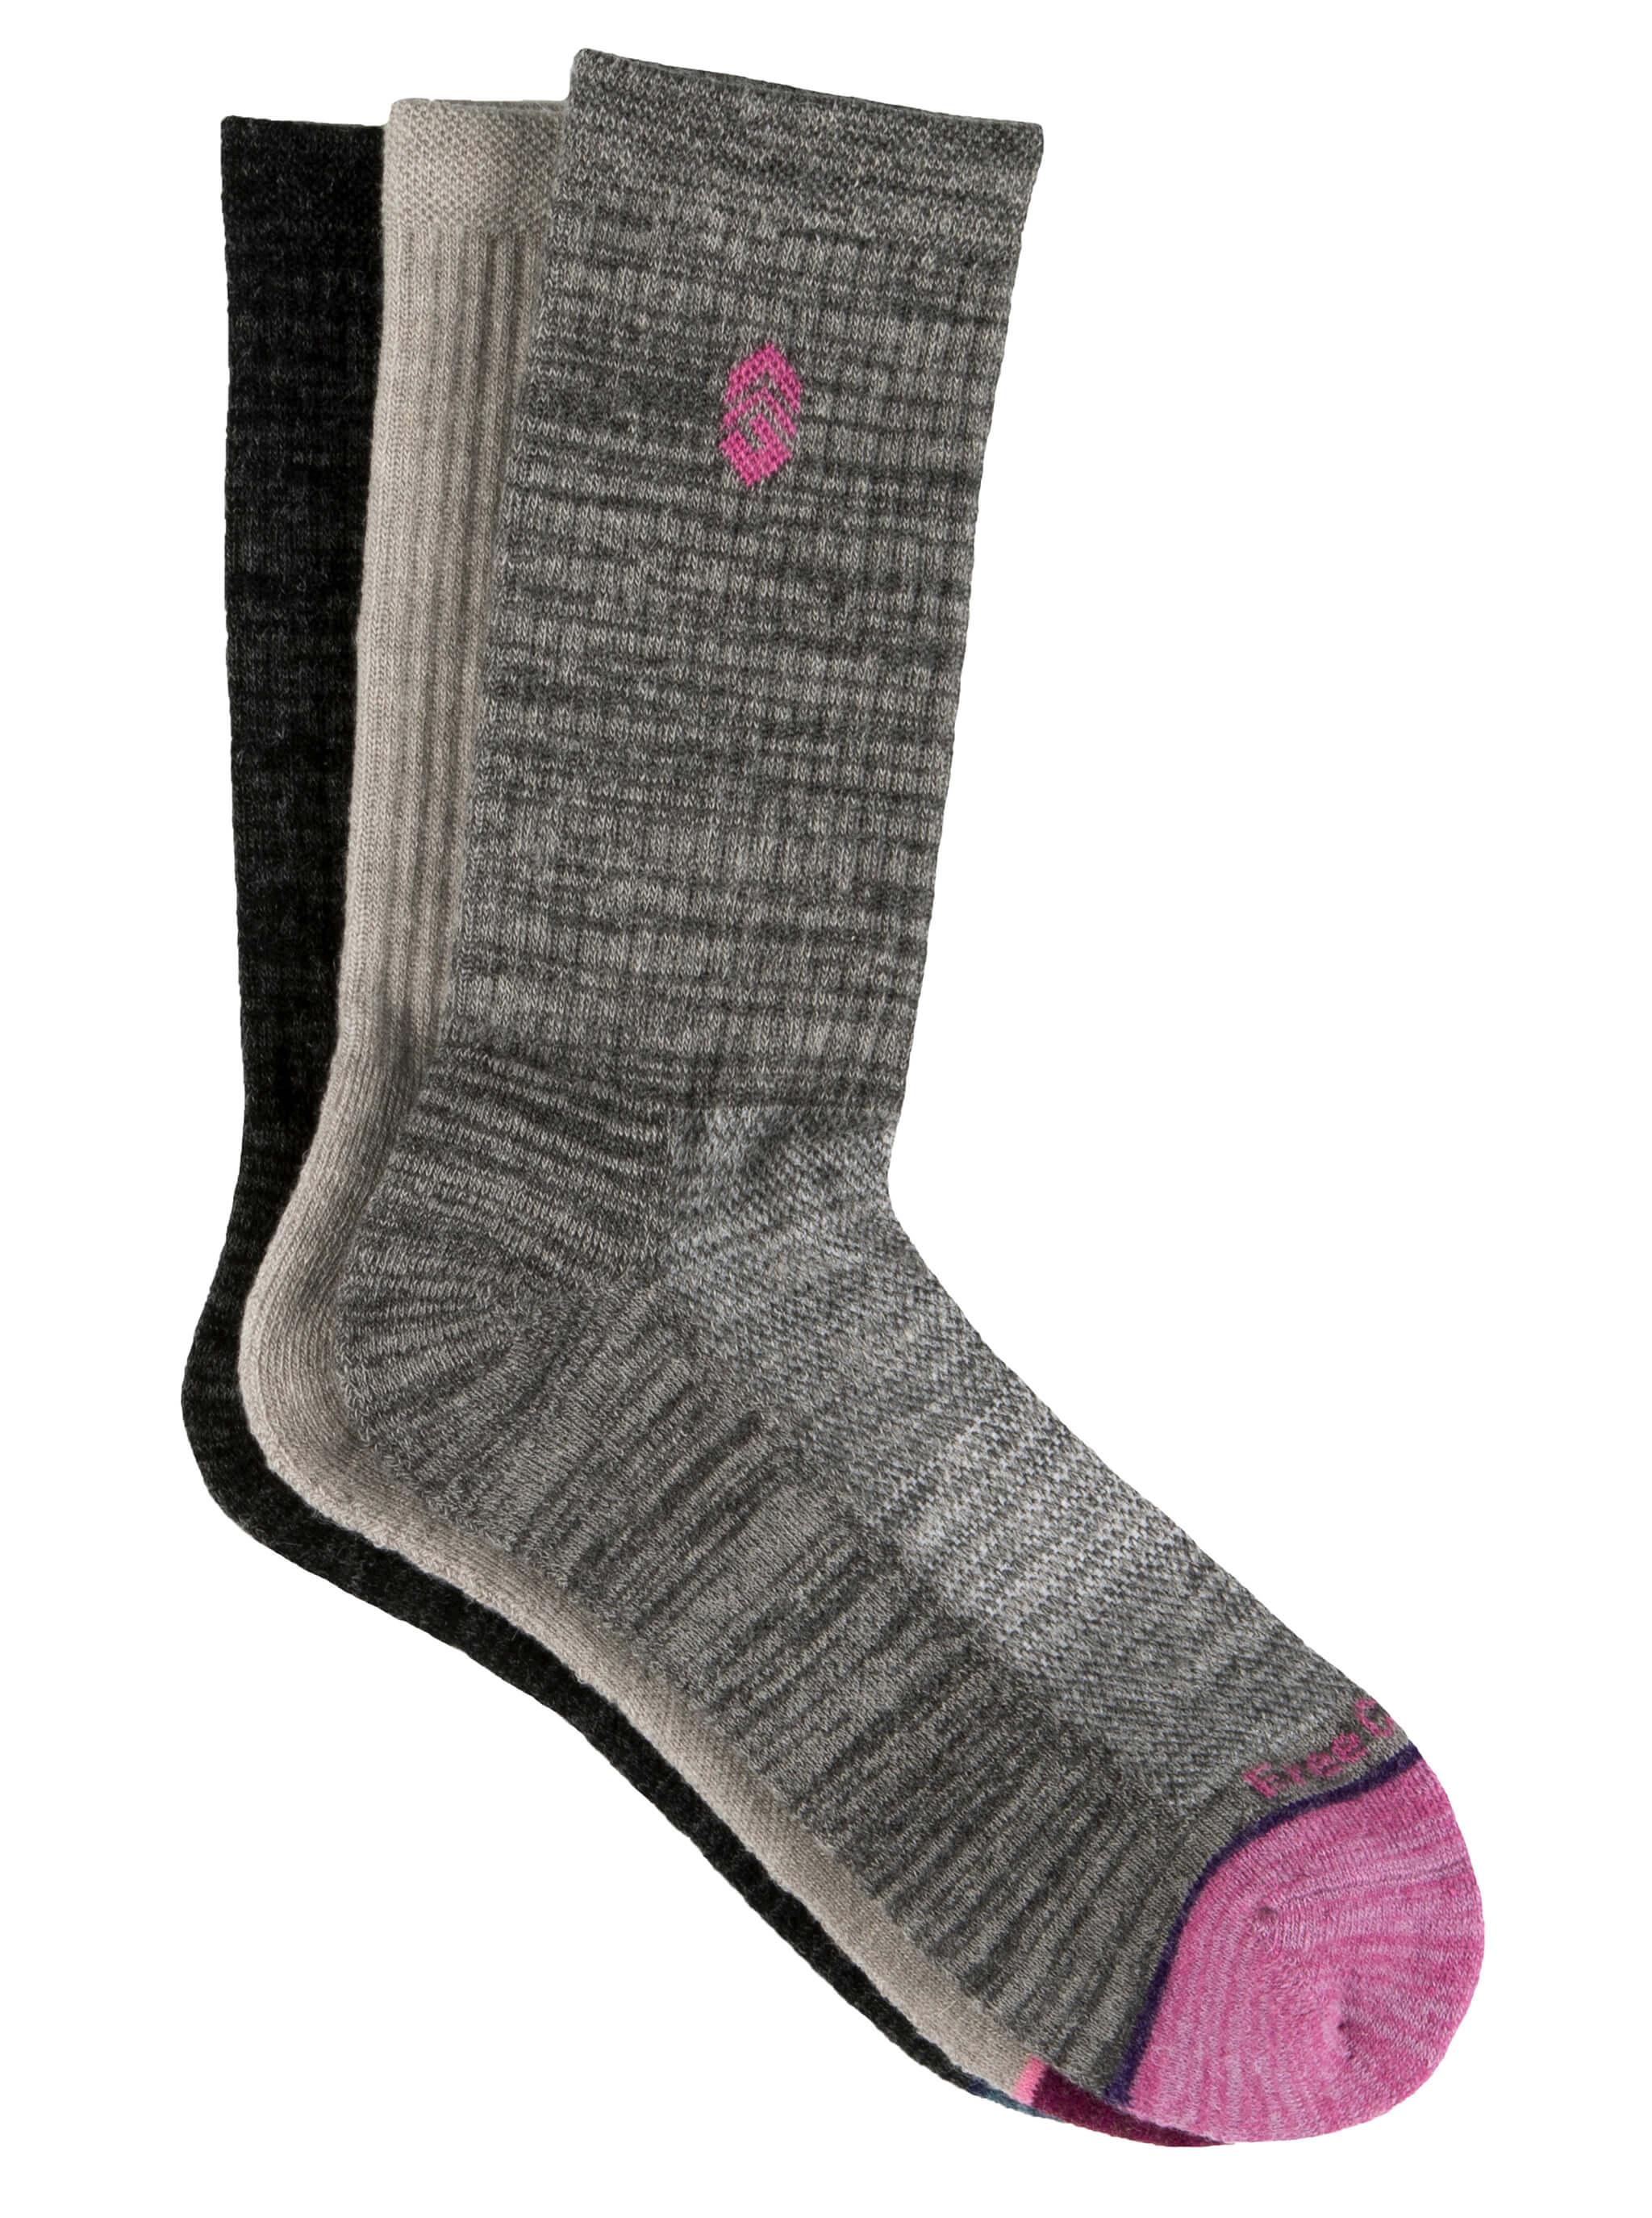 Women's Wool-Blend Basic Toe Pop Crew Socks